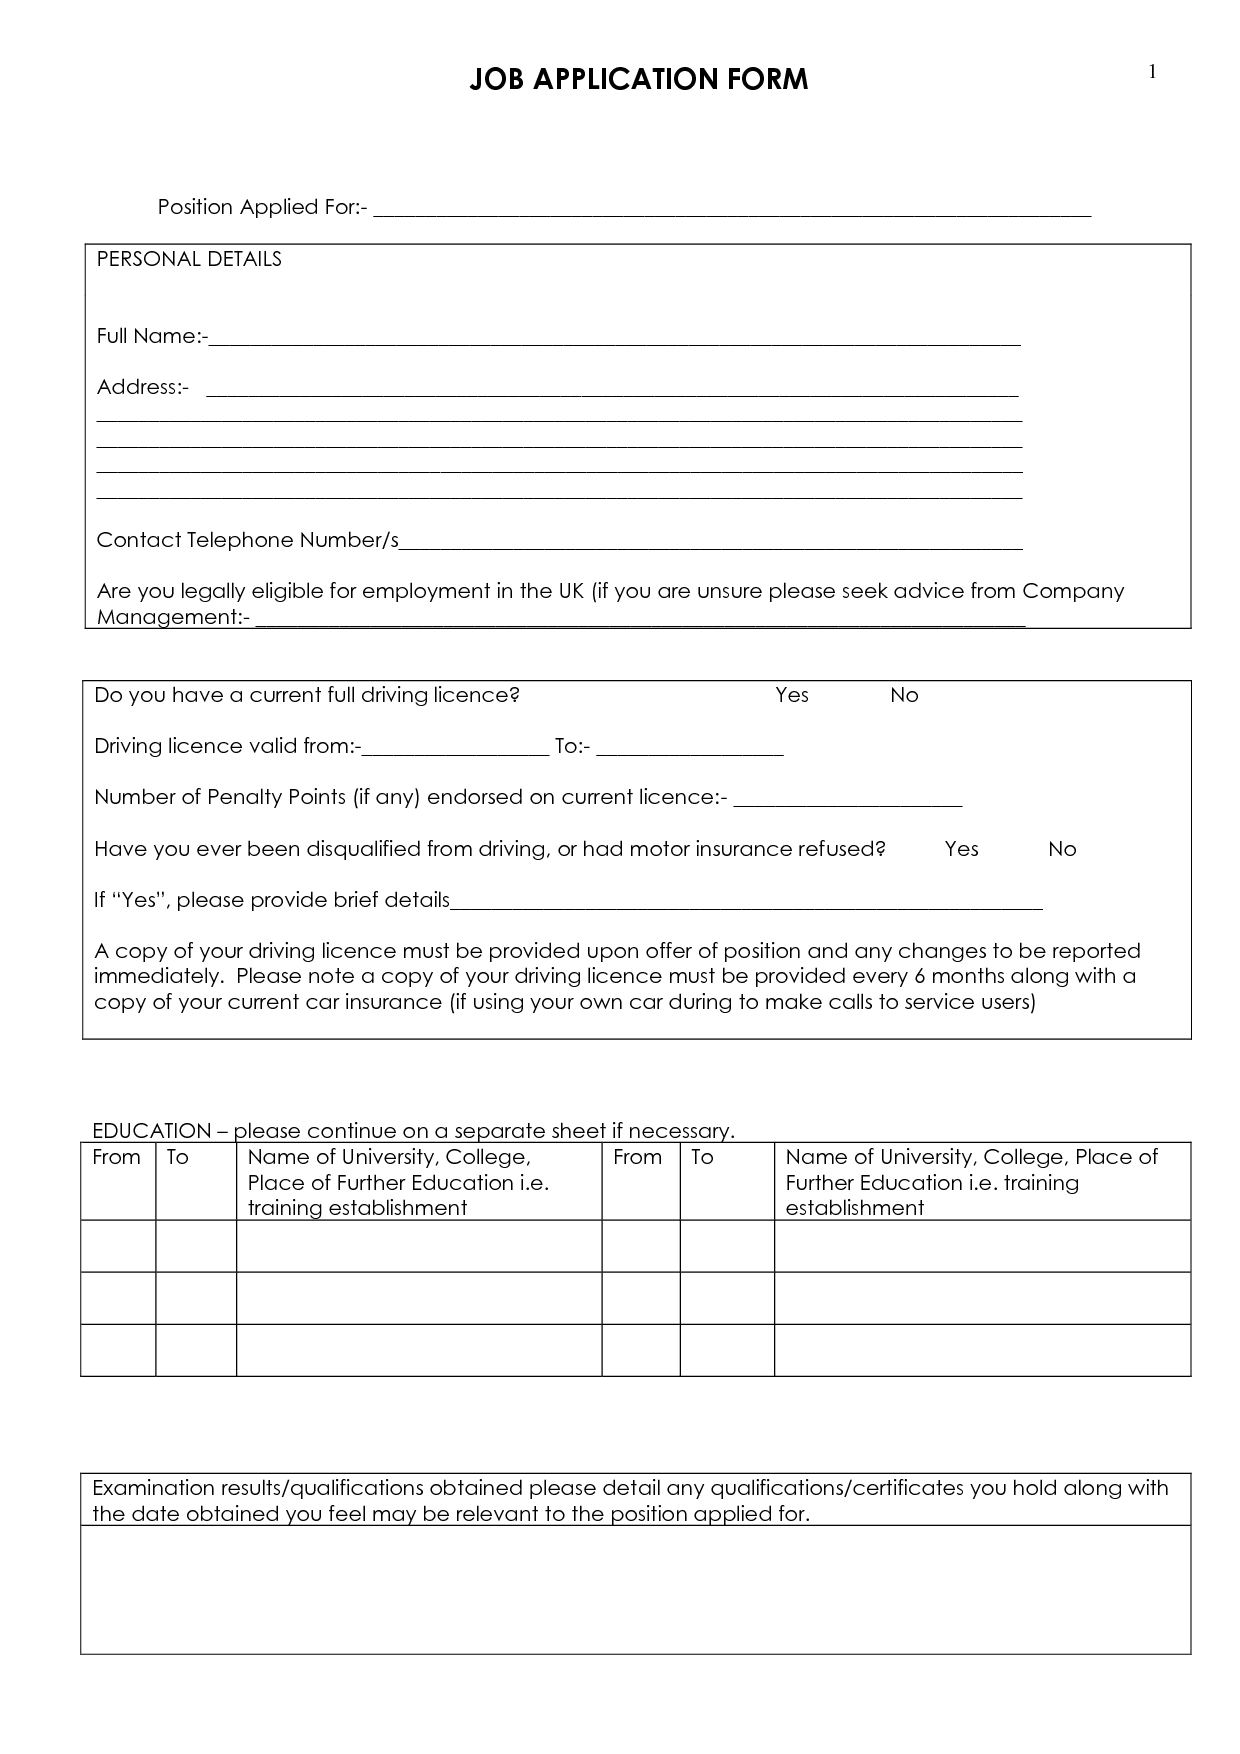 Job Application Form To Print Blank Job Application Forms